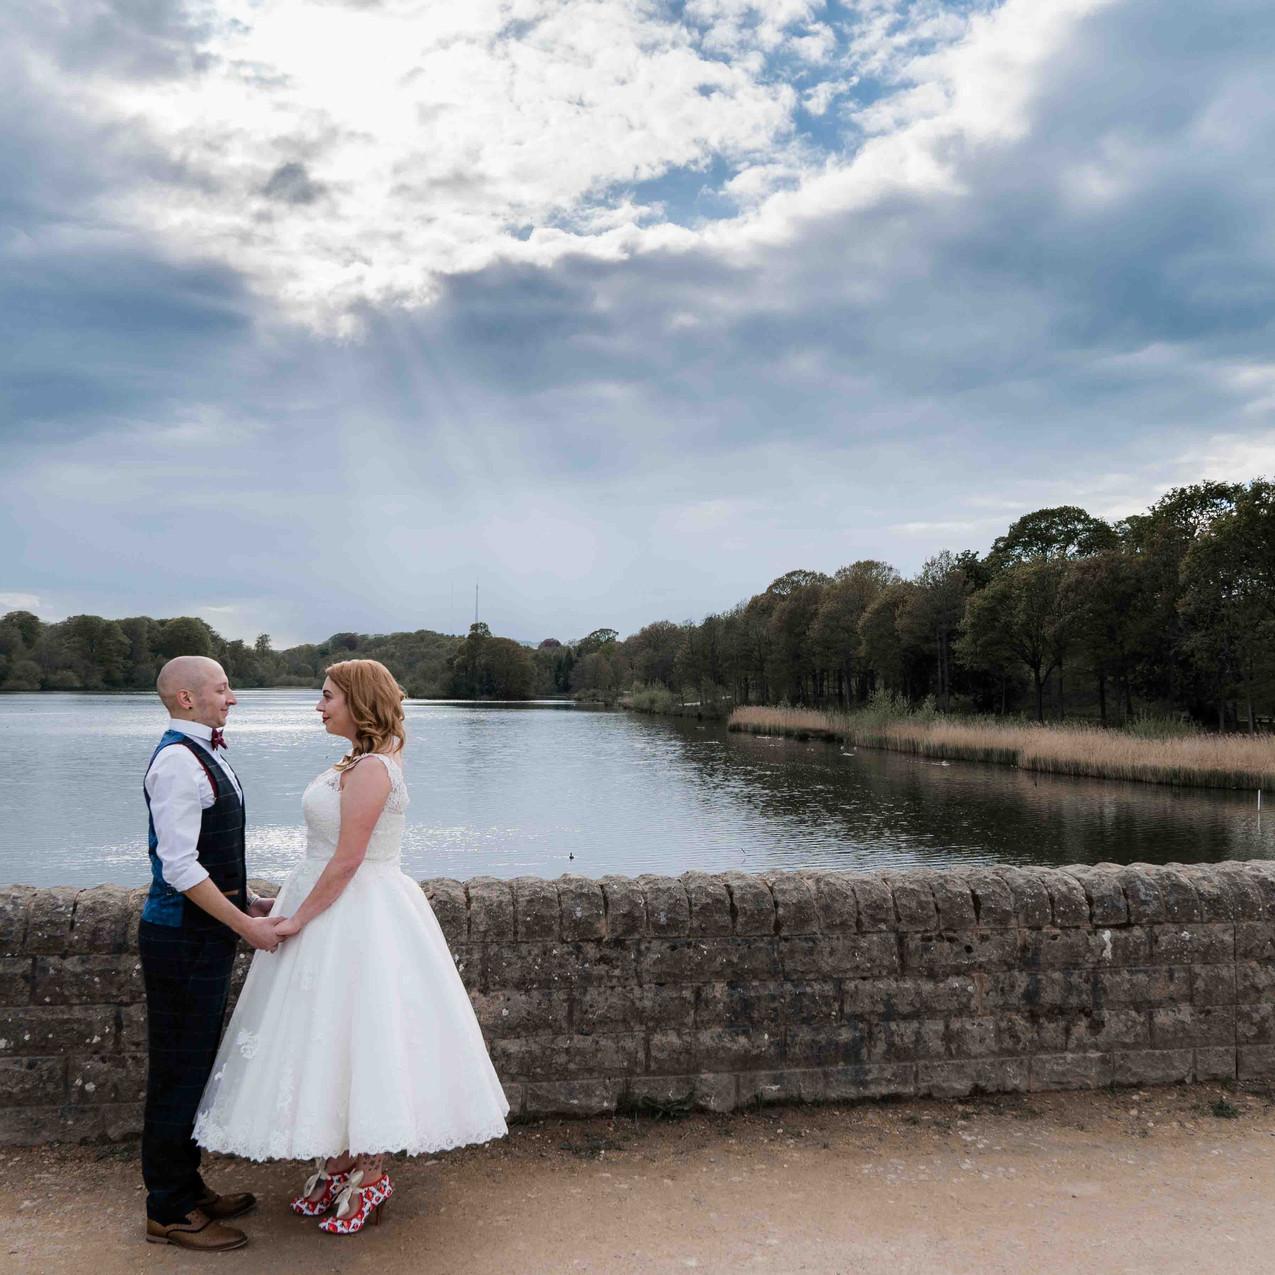 Creative wedding photographs